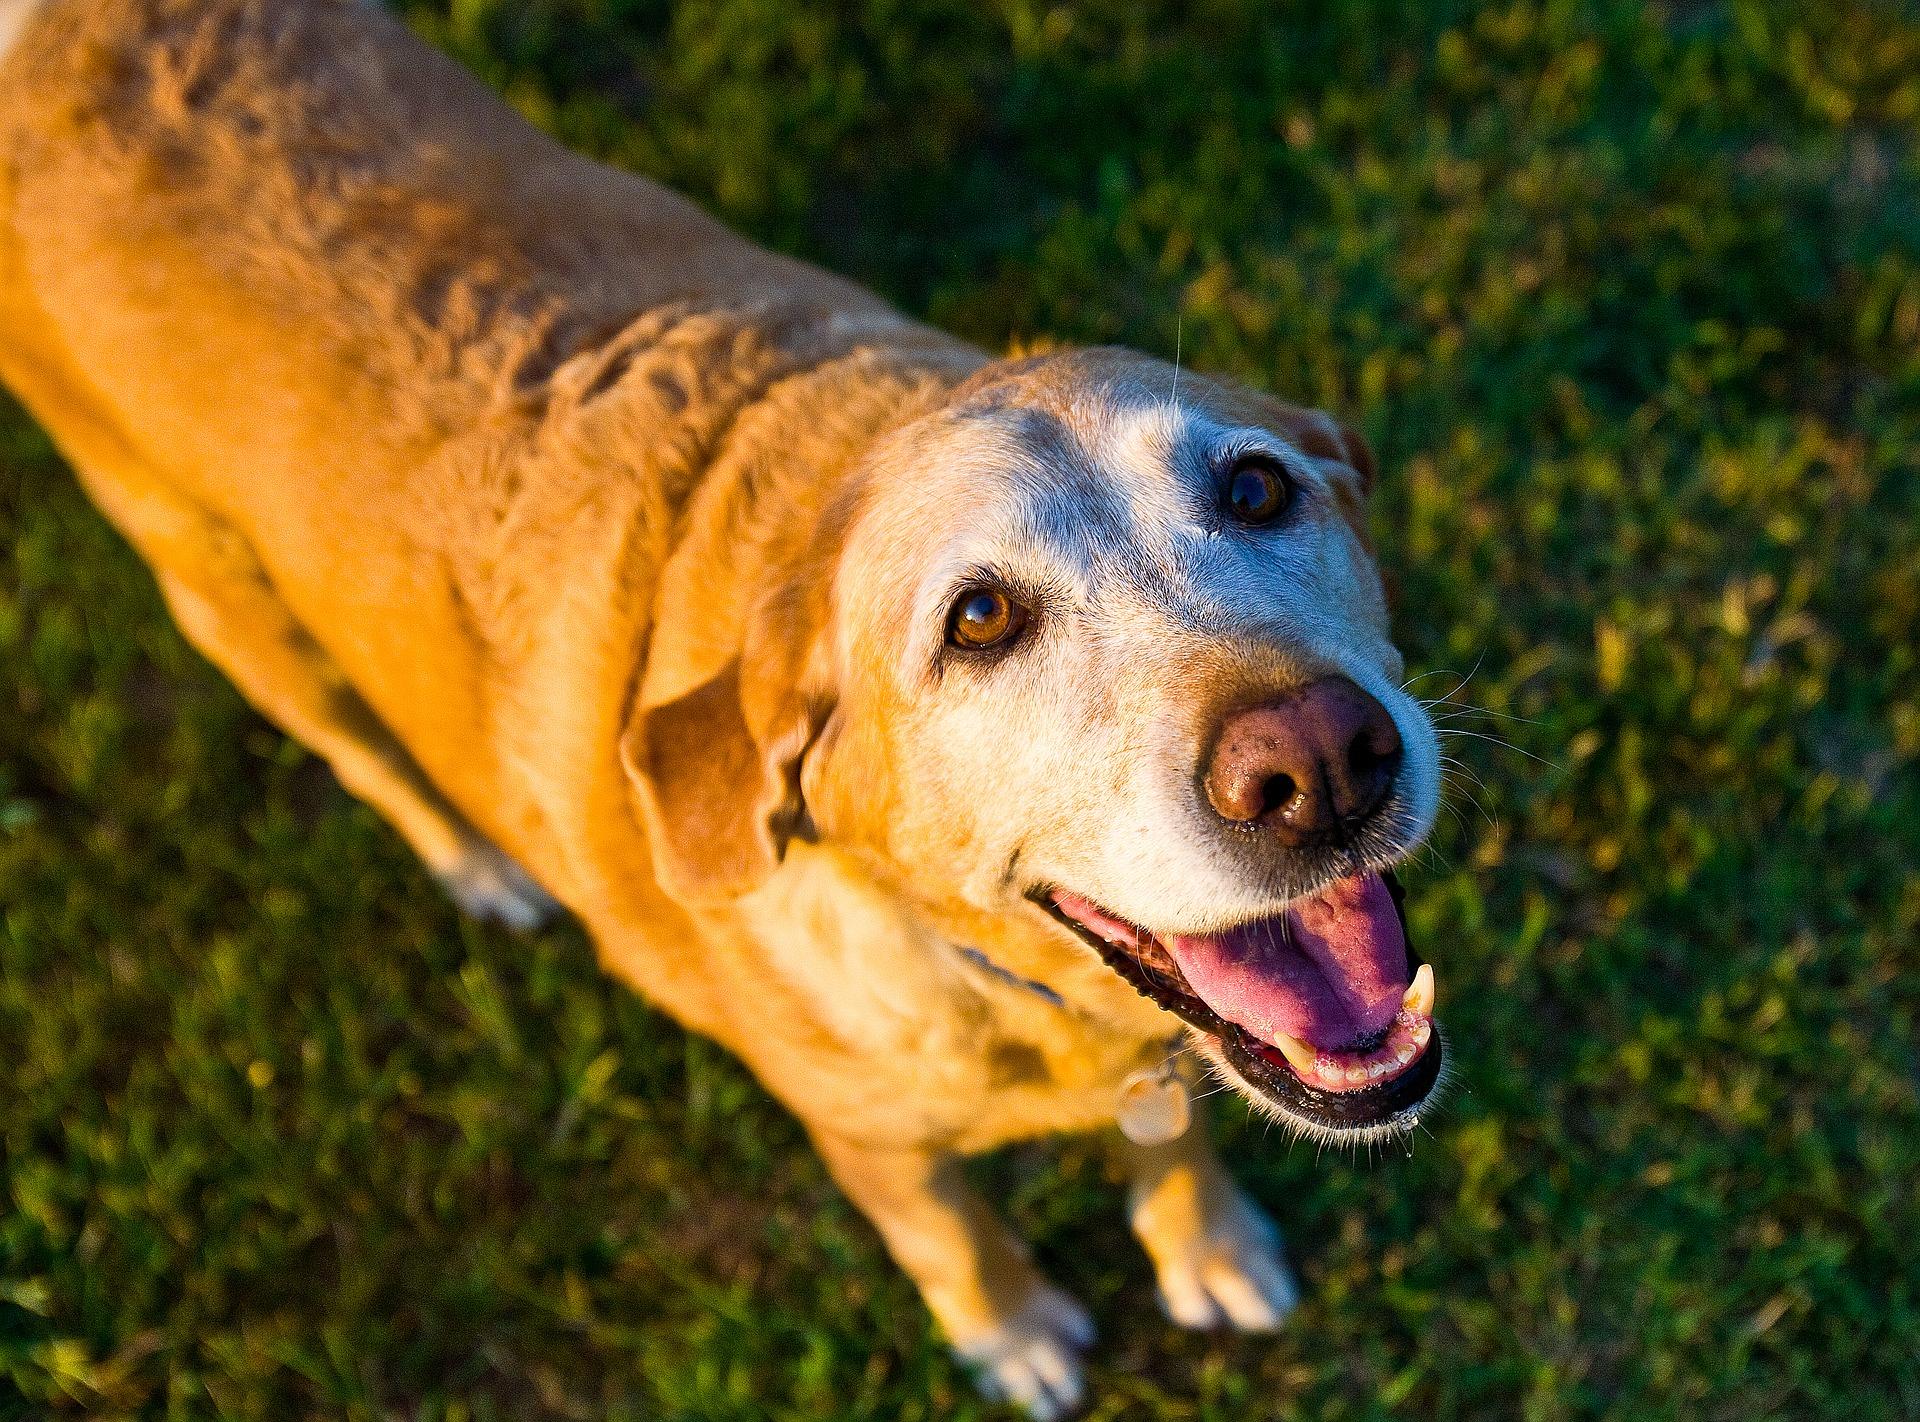 Dog Cardiology - Age or Illness?